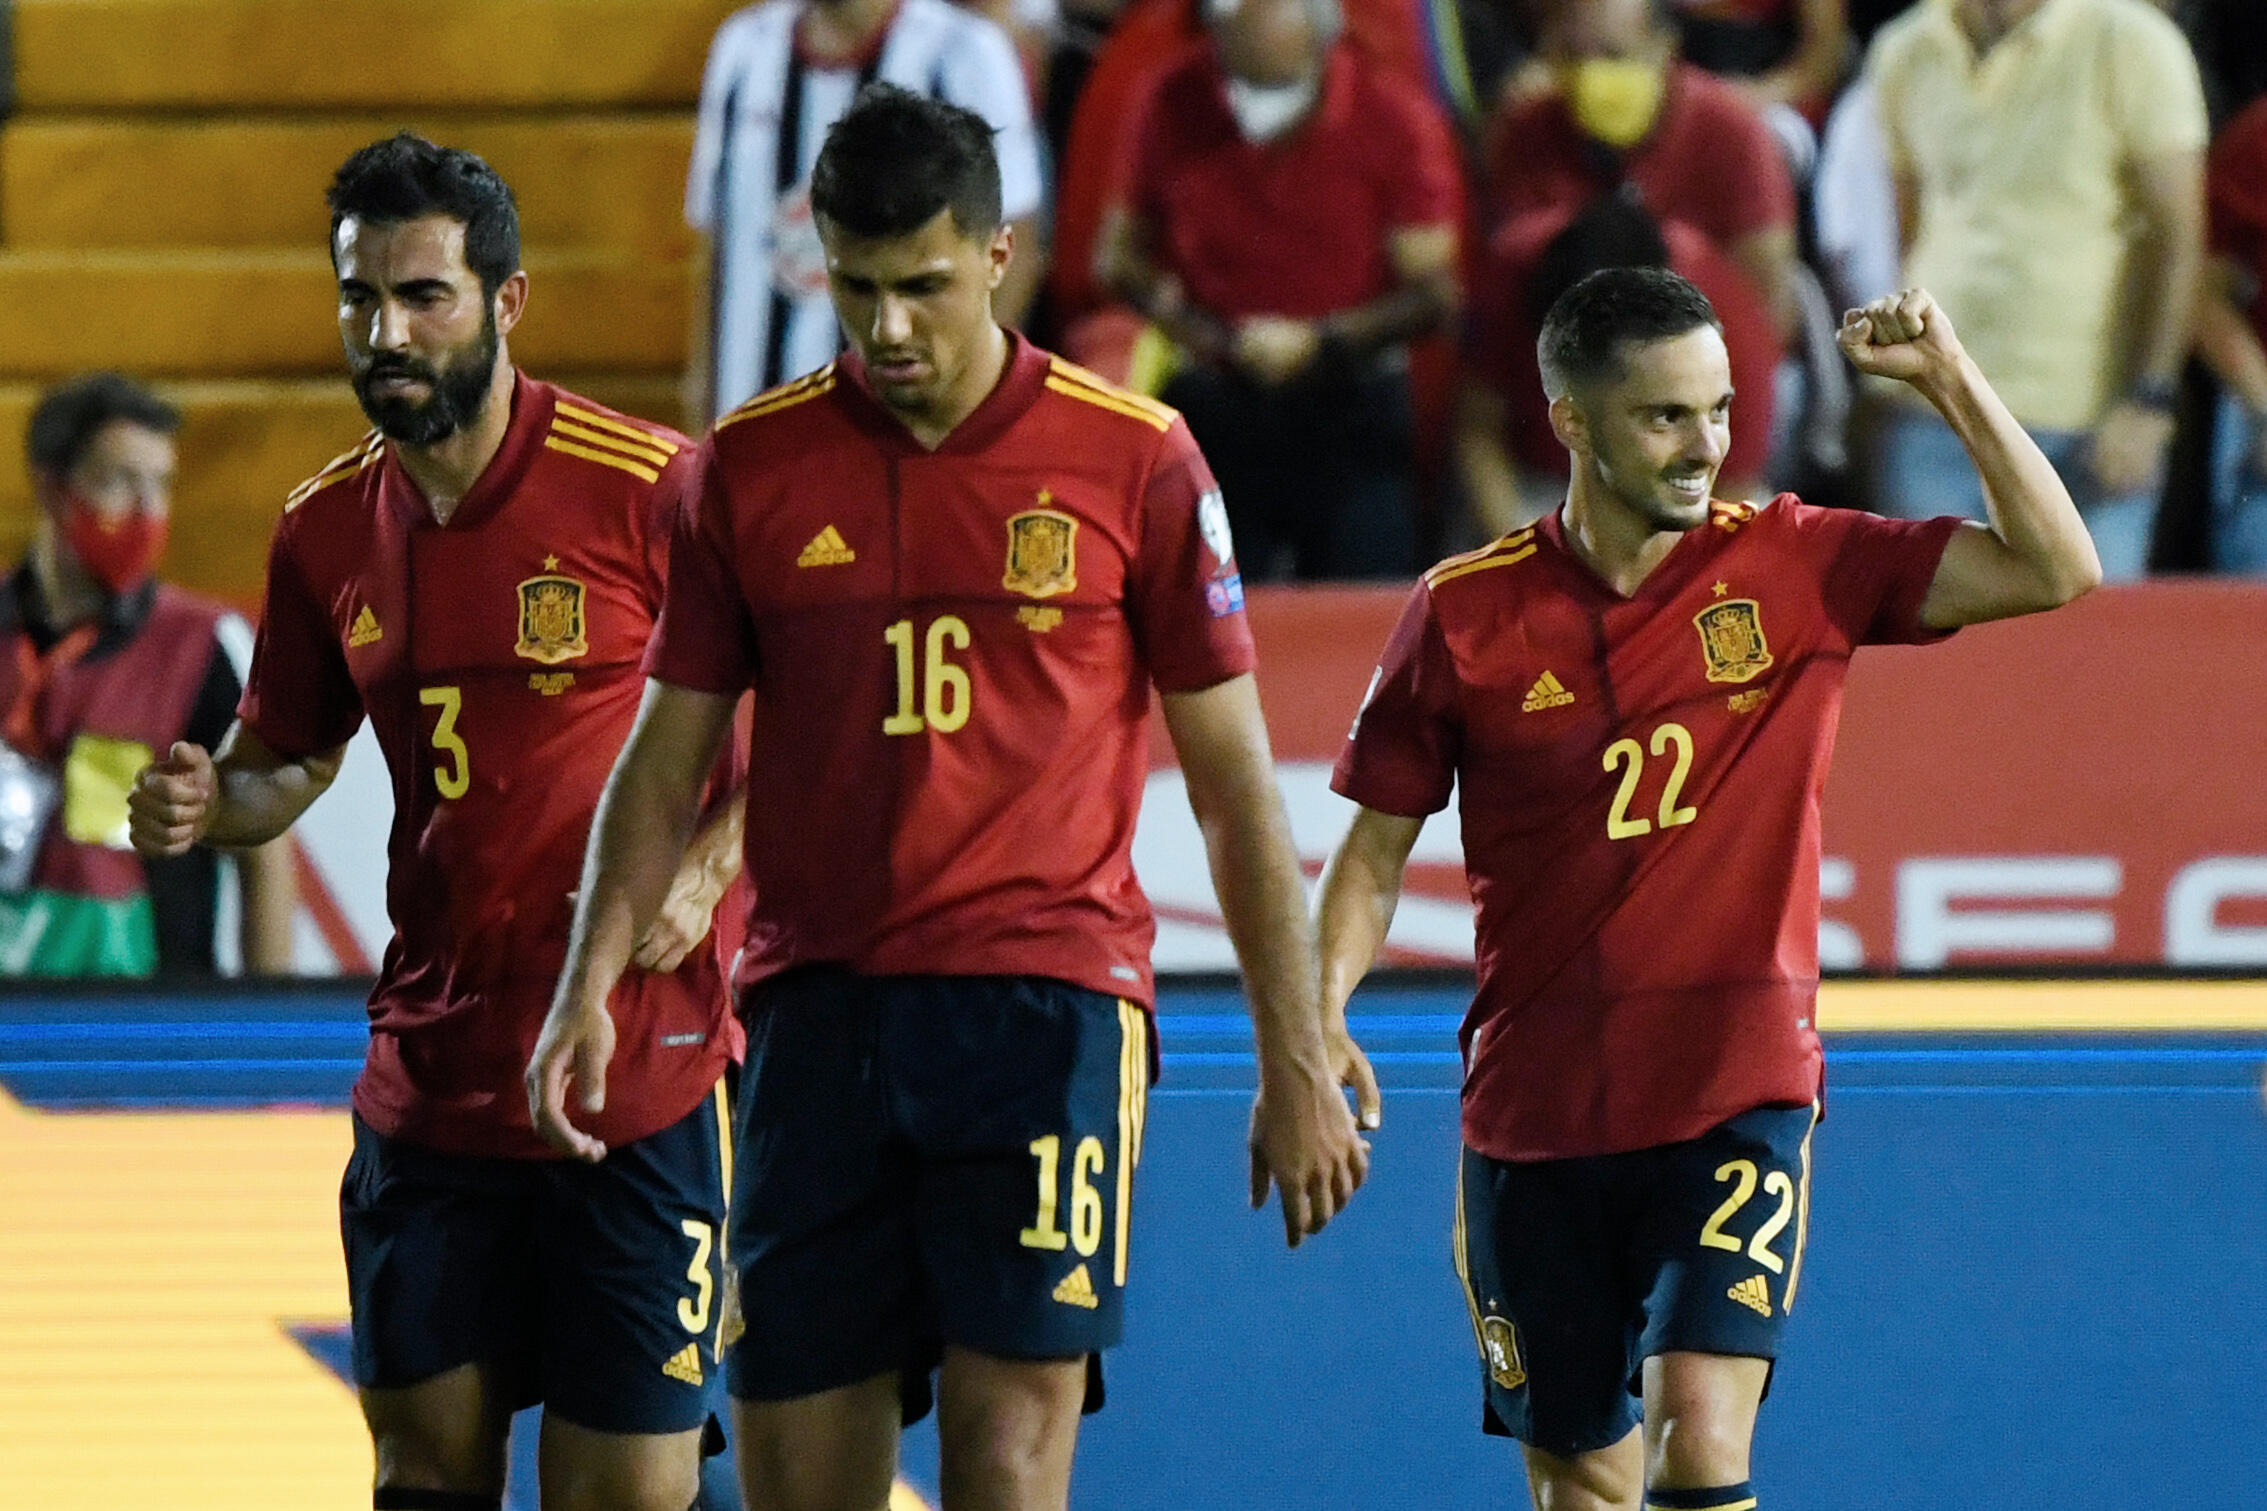 Pablo Sarabia (# 22) Celebrates His Goal With His Companions, Spain 4th, 4th against Georgia, September 5, 2021